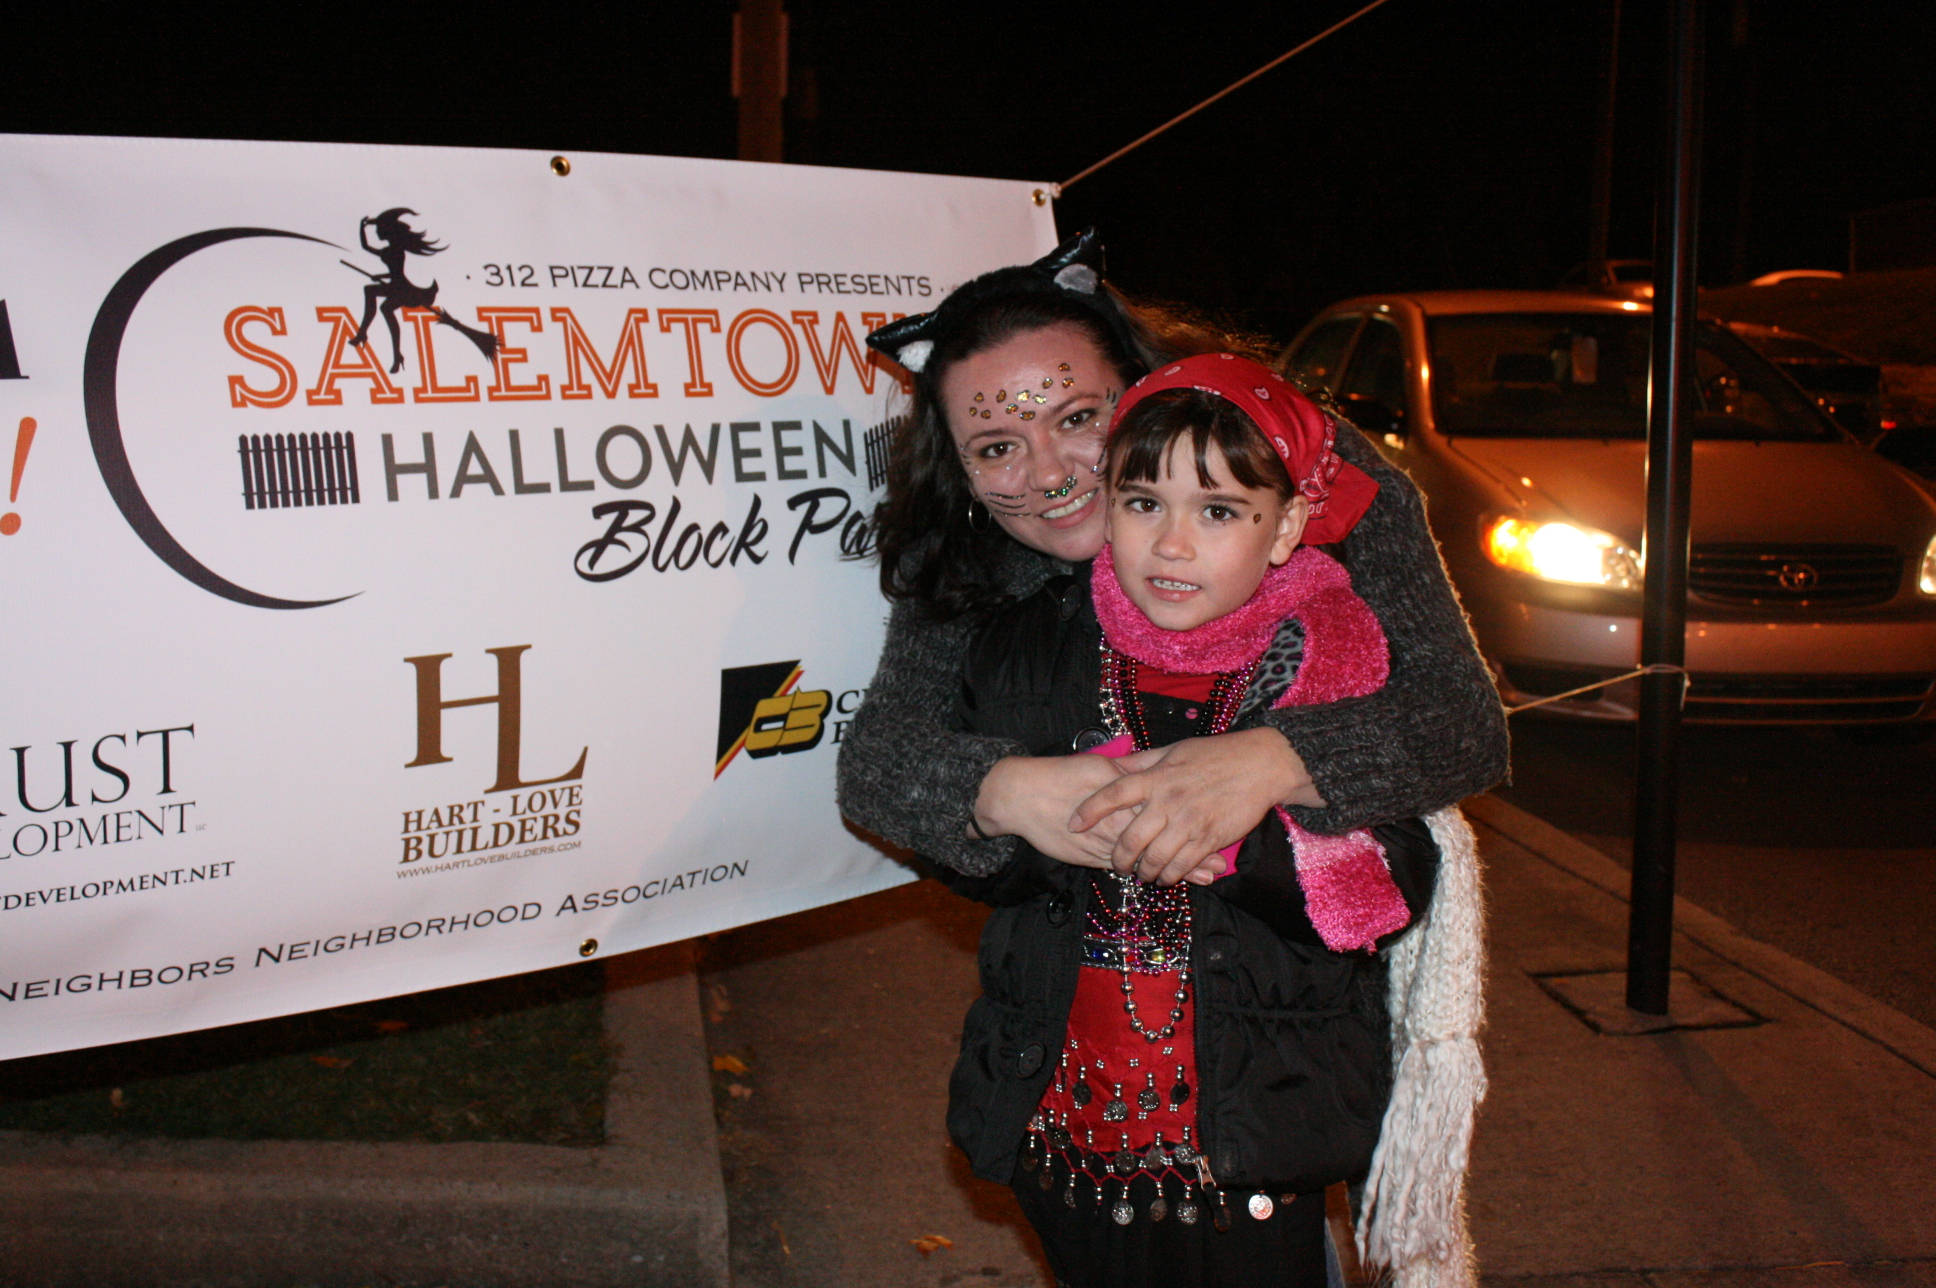 HL Community Involvement Salemtown Neighborhood